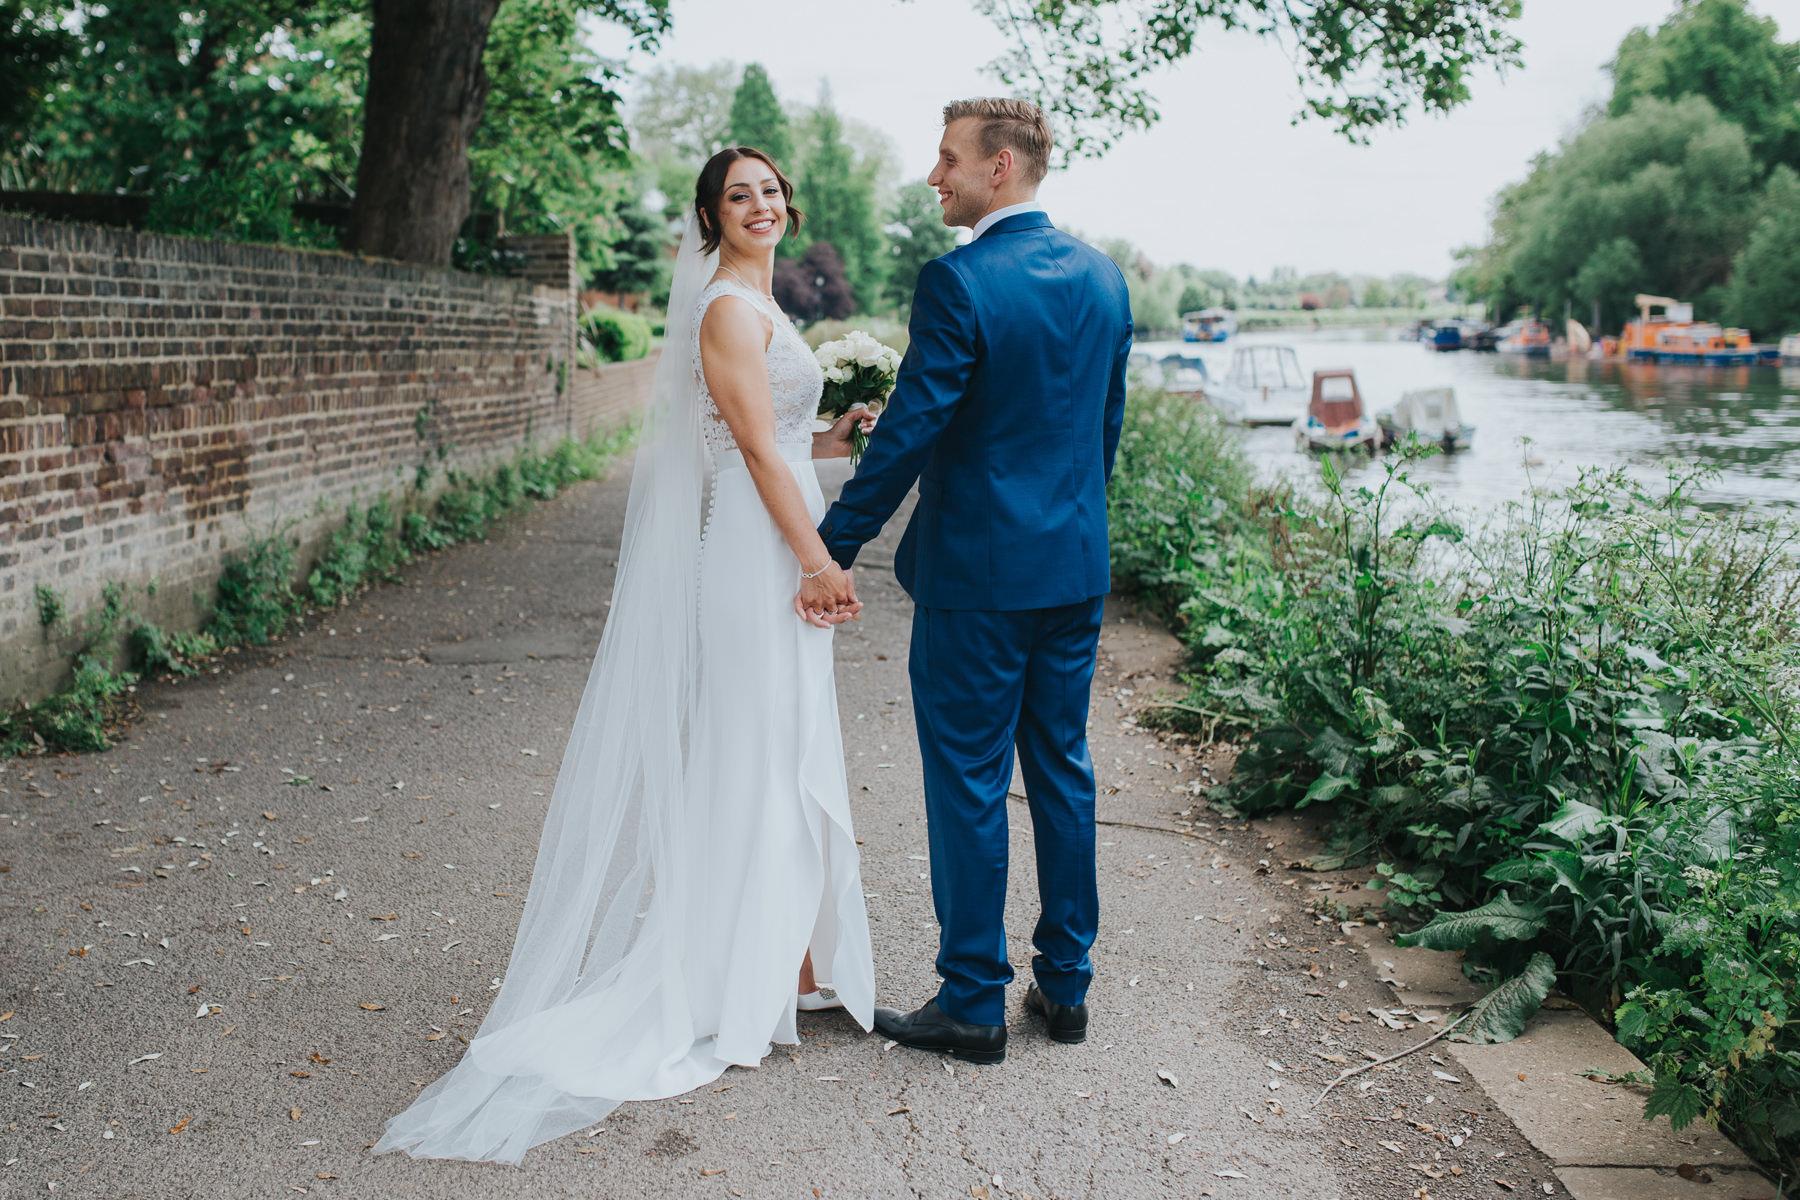 CRL-369-The Bingham wedding Richmond-Claire Rob bridal couple portraits on Thamespath.jpg